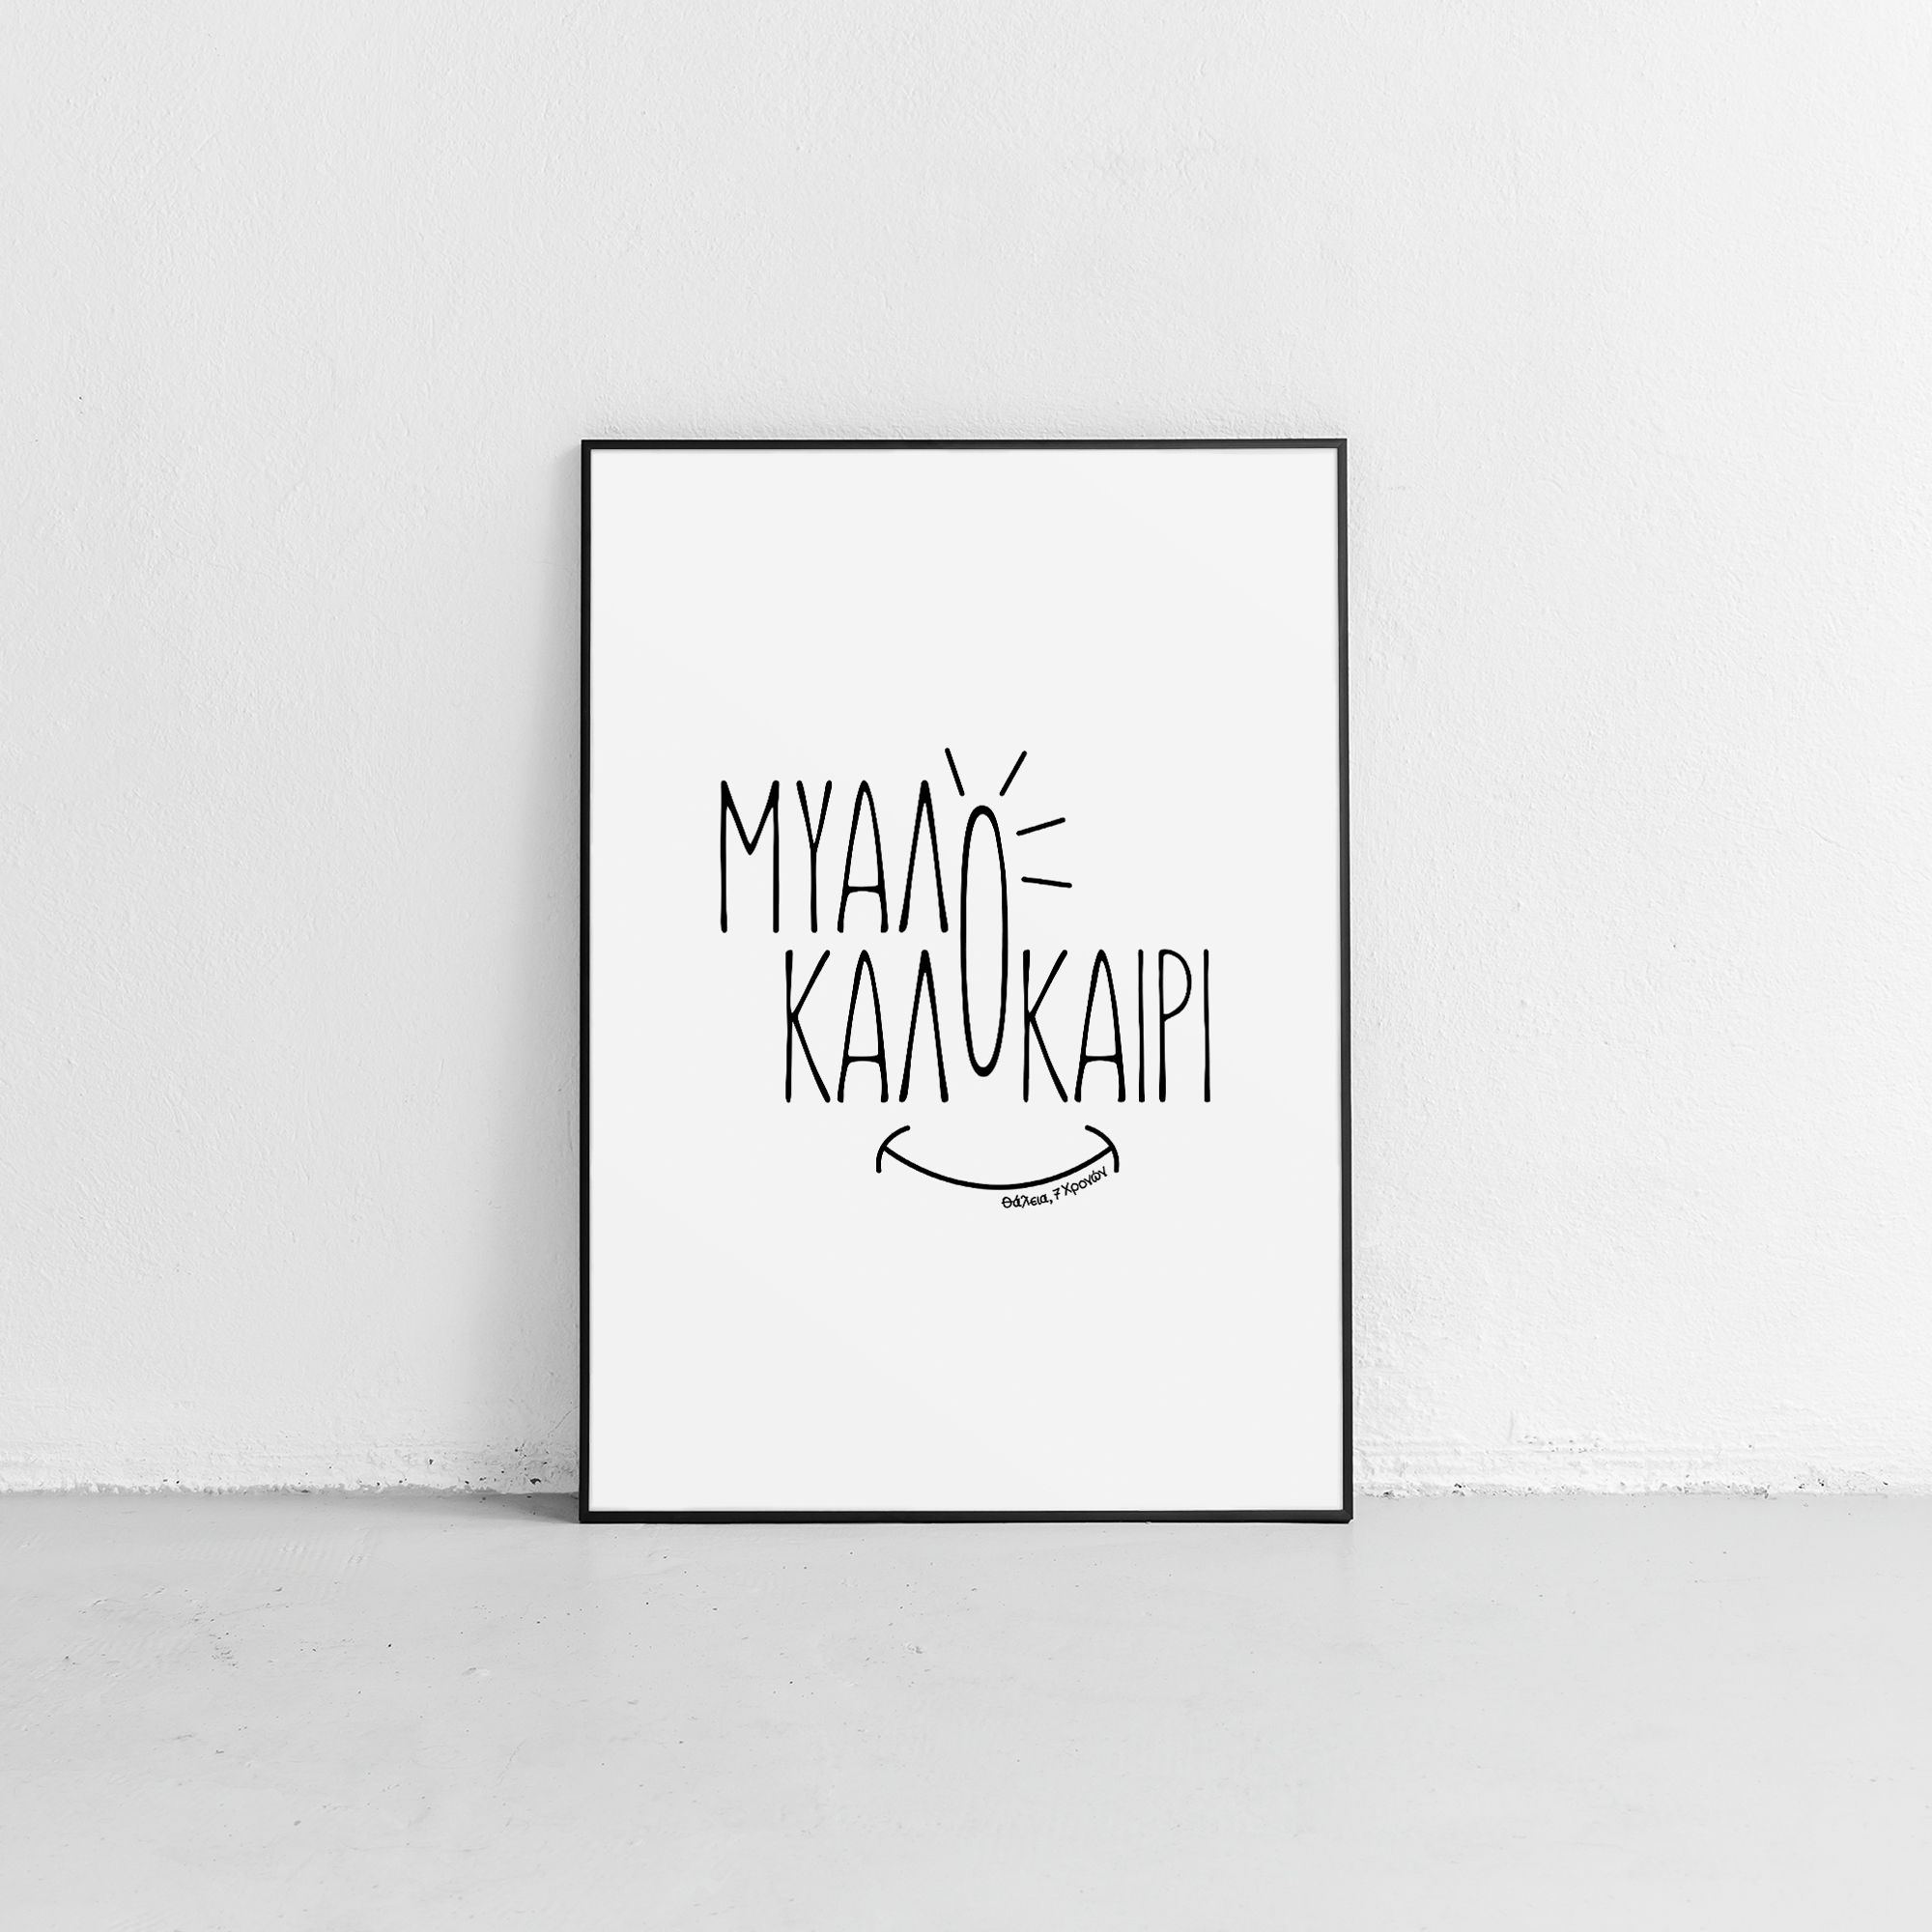 Myalo Kalokairi design in a black frame